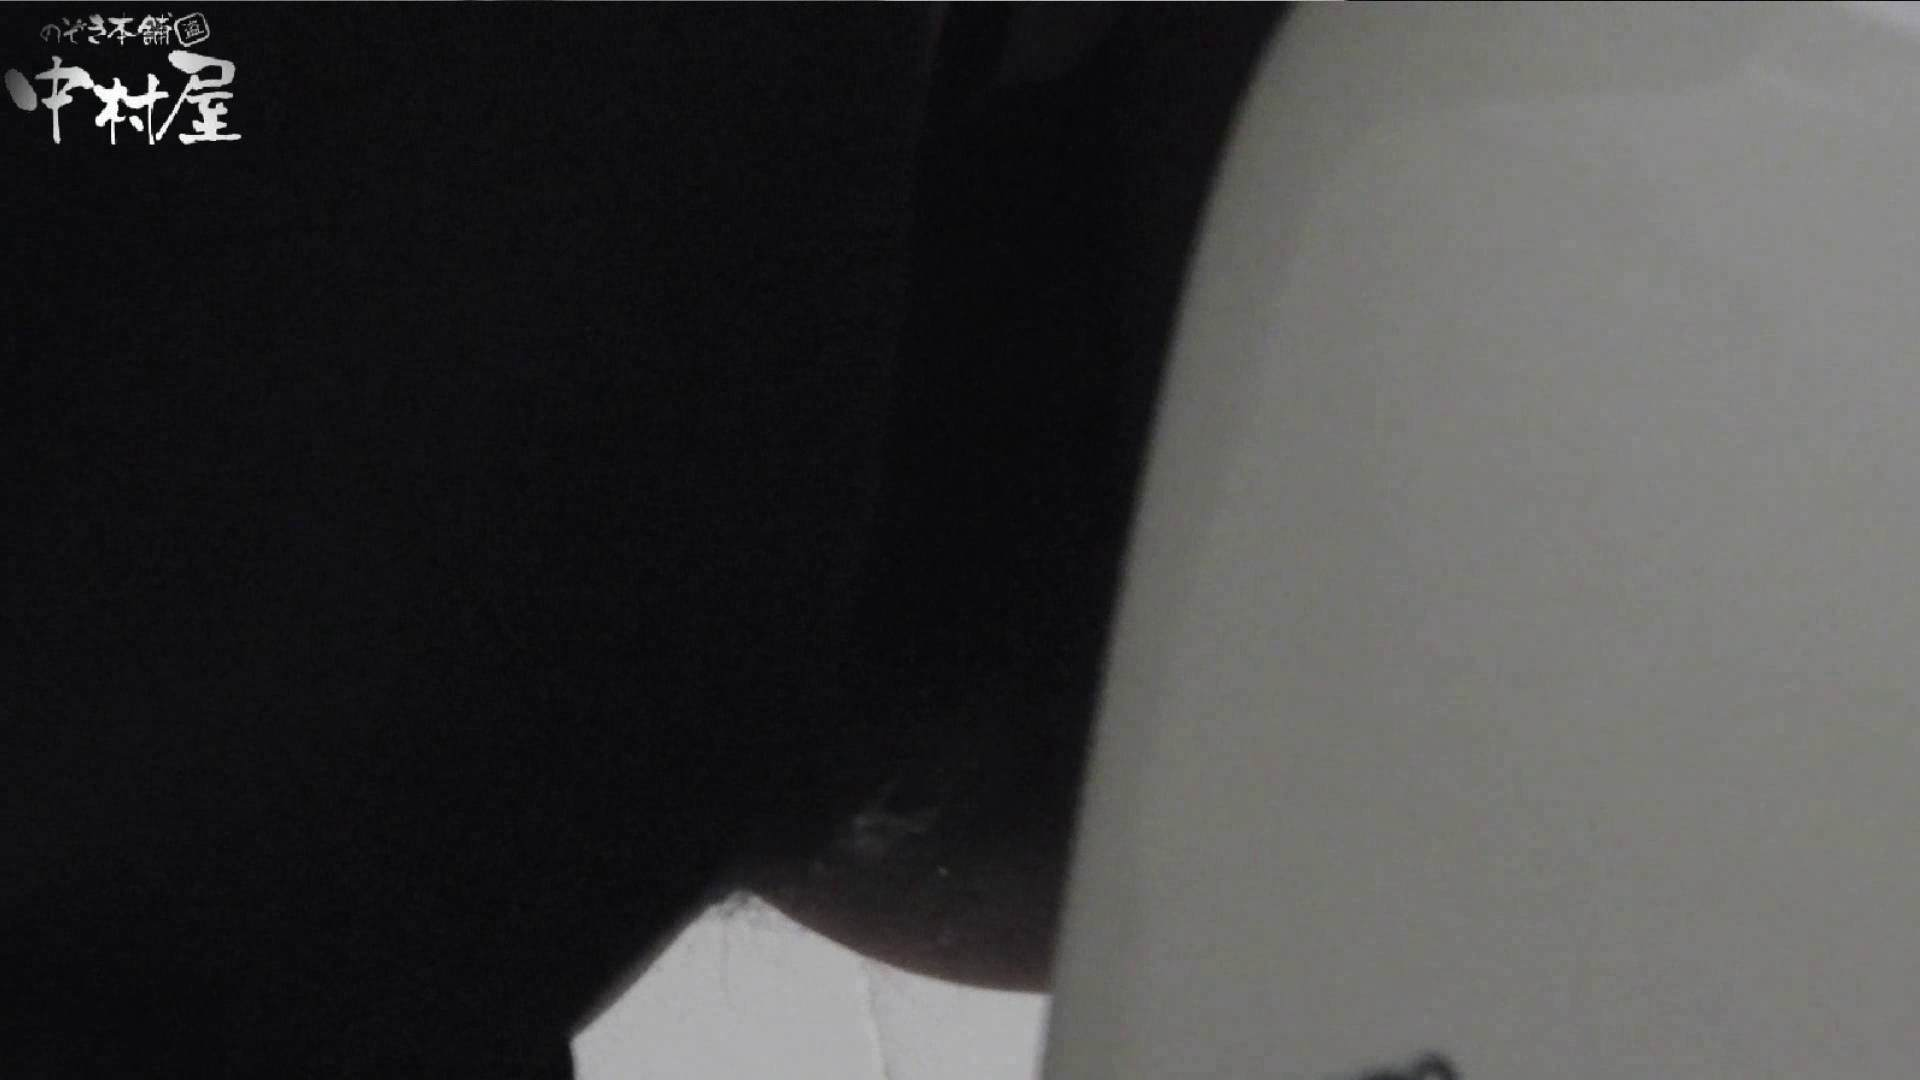 vol.24 命がけ潜伏洗面所! 剛毛さんいらっしゃい後編 プライベート セックス無修正動画無料 102PIX 38